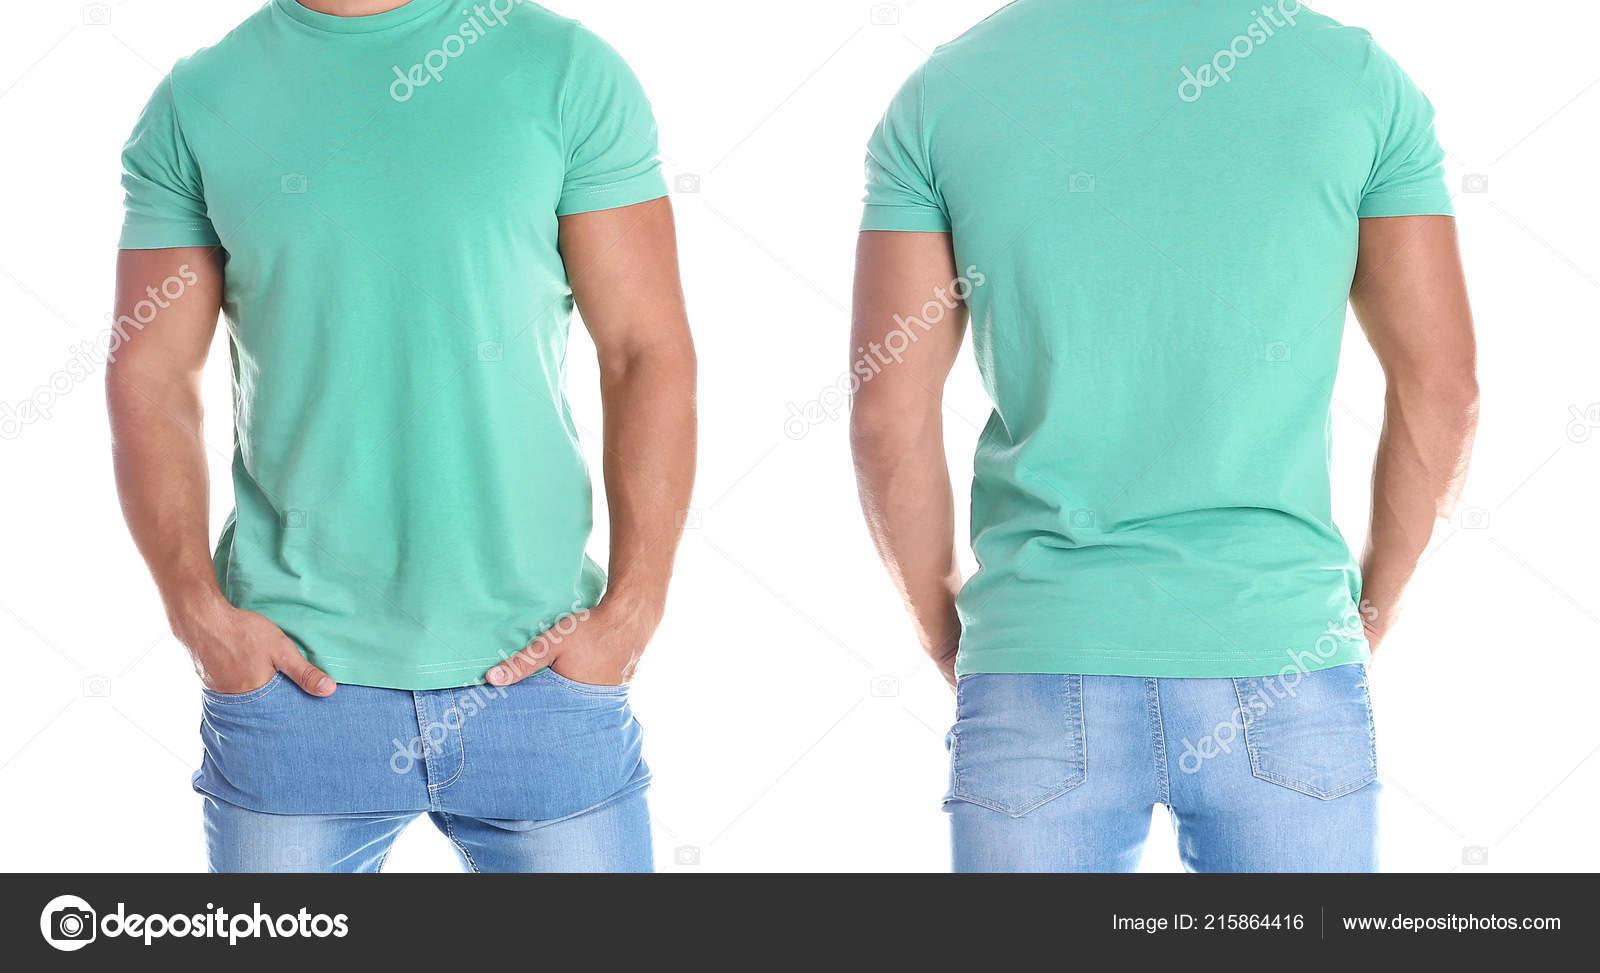 teal shirt back